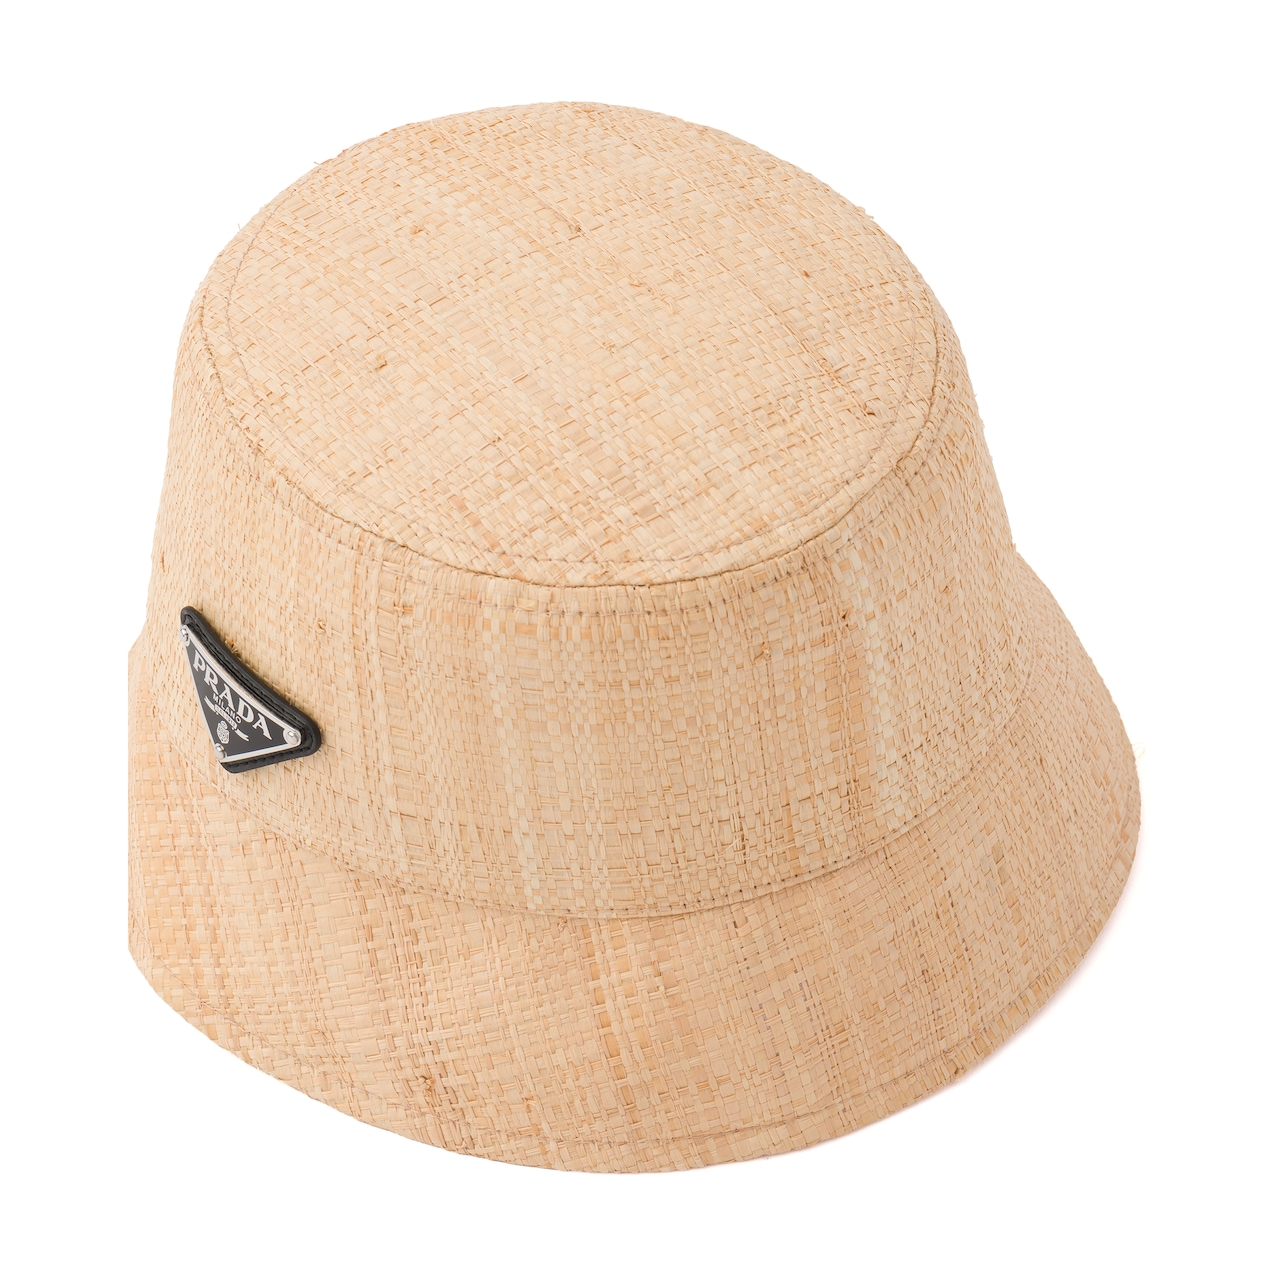 Prada Straw hat 4